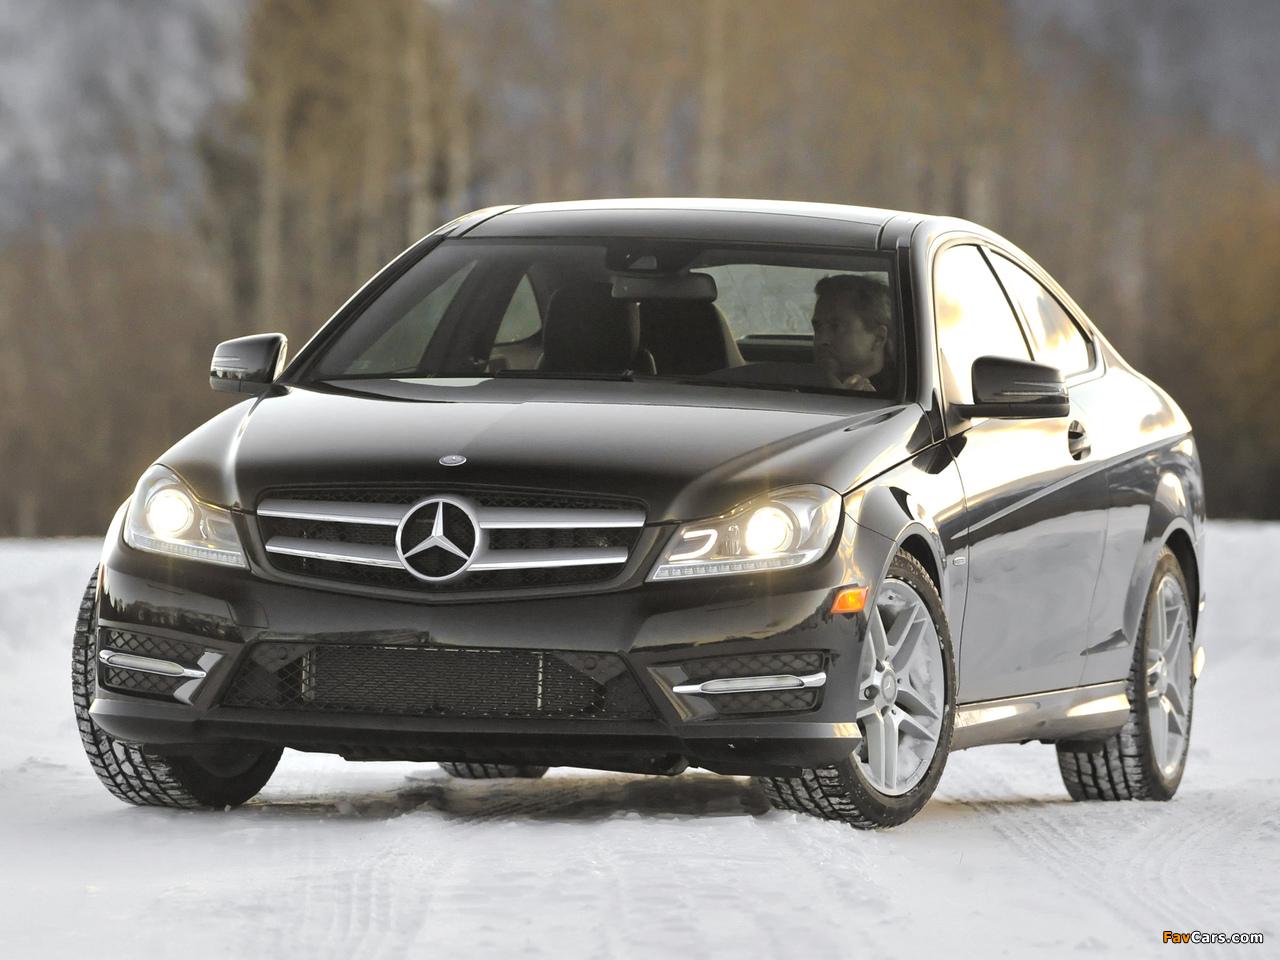 Mercedes-Benz C 350 4MATIC Coupe US-spec (C204) 2011 wallpapers (1280 x 960)